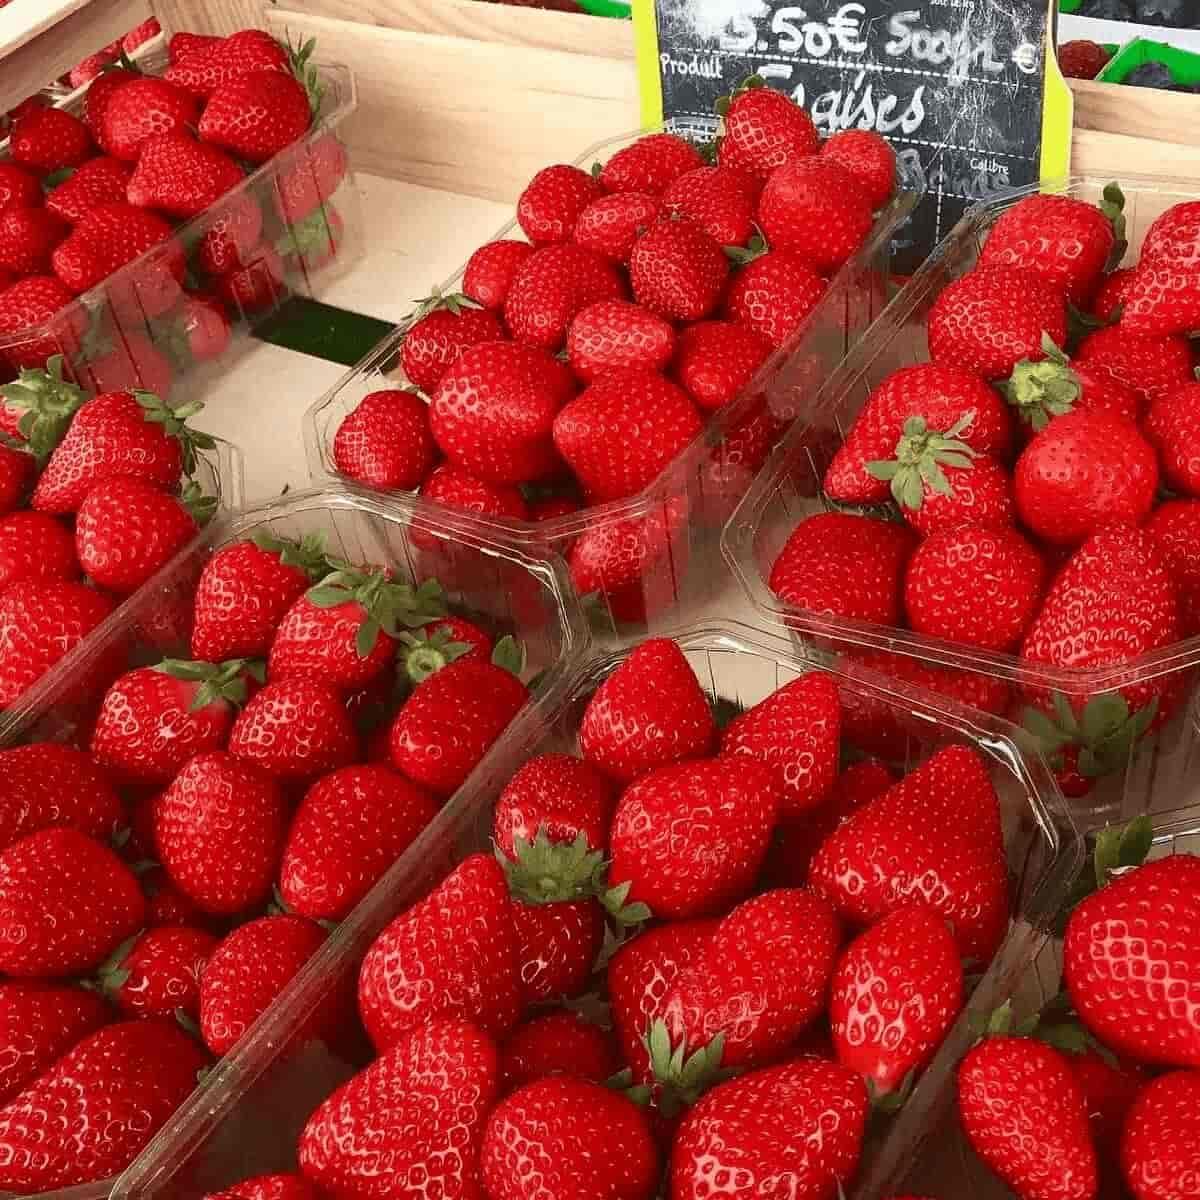 french market strawberries